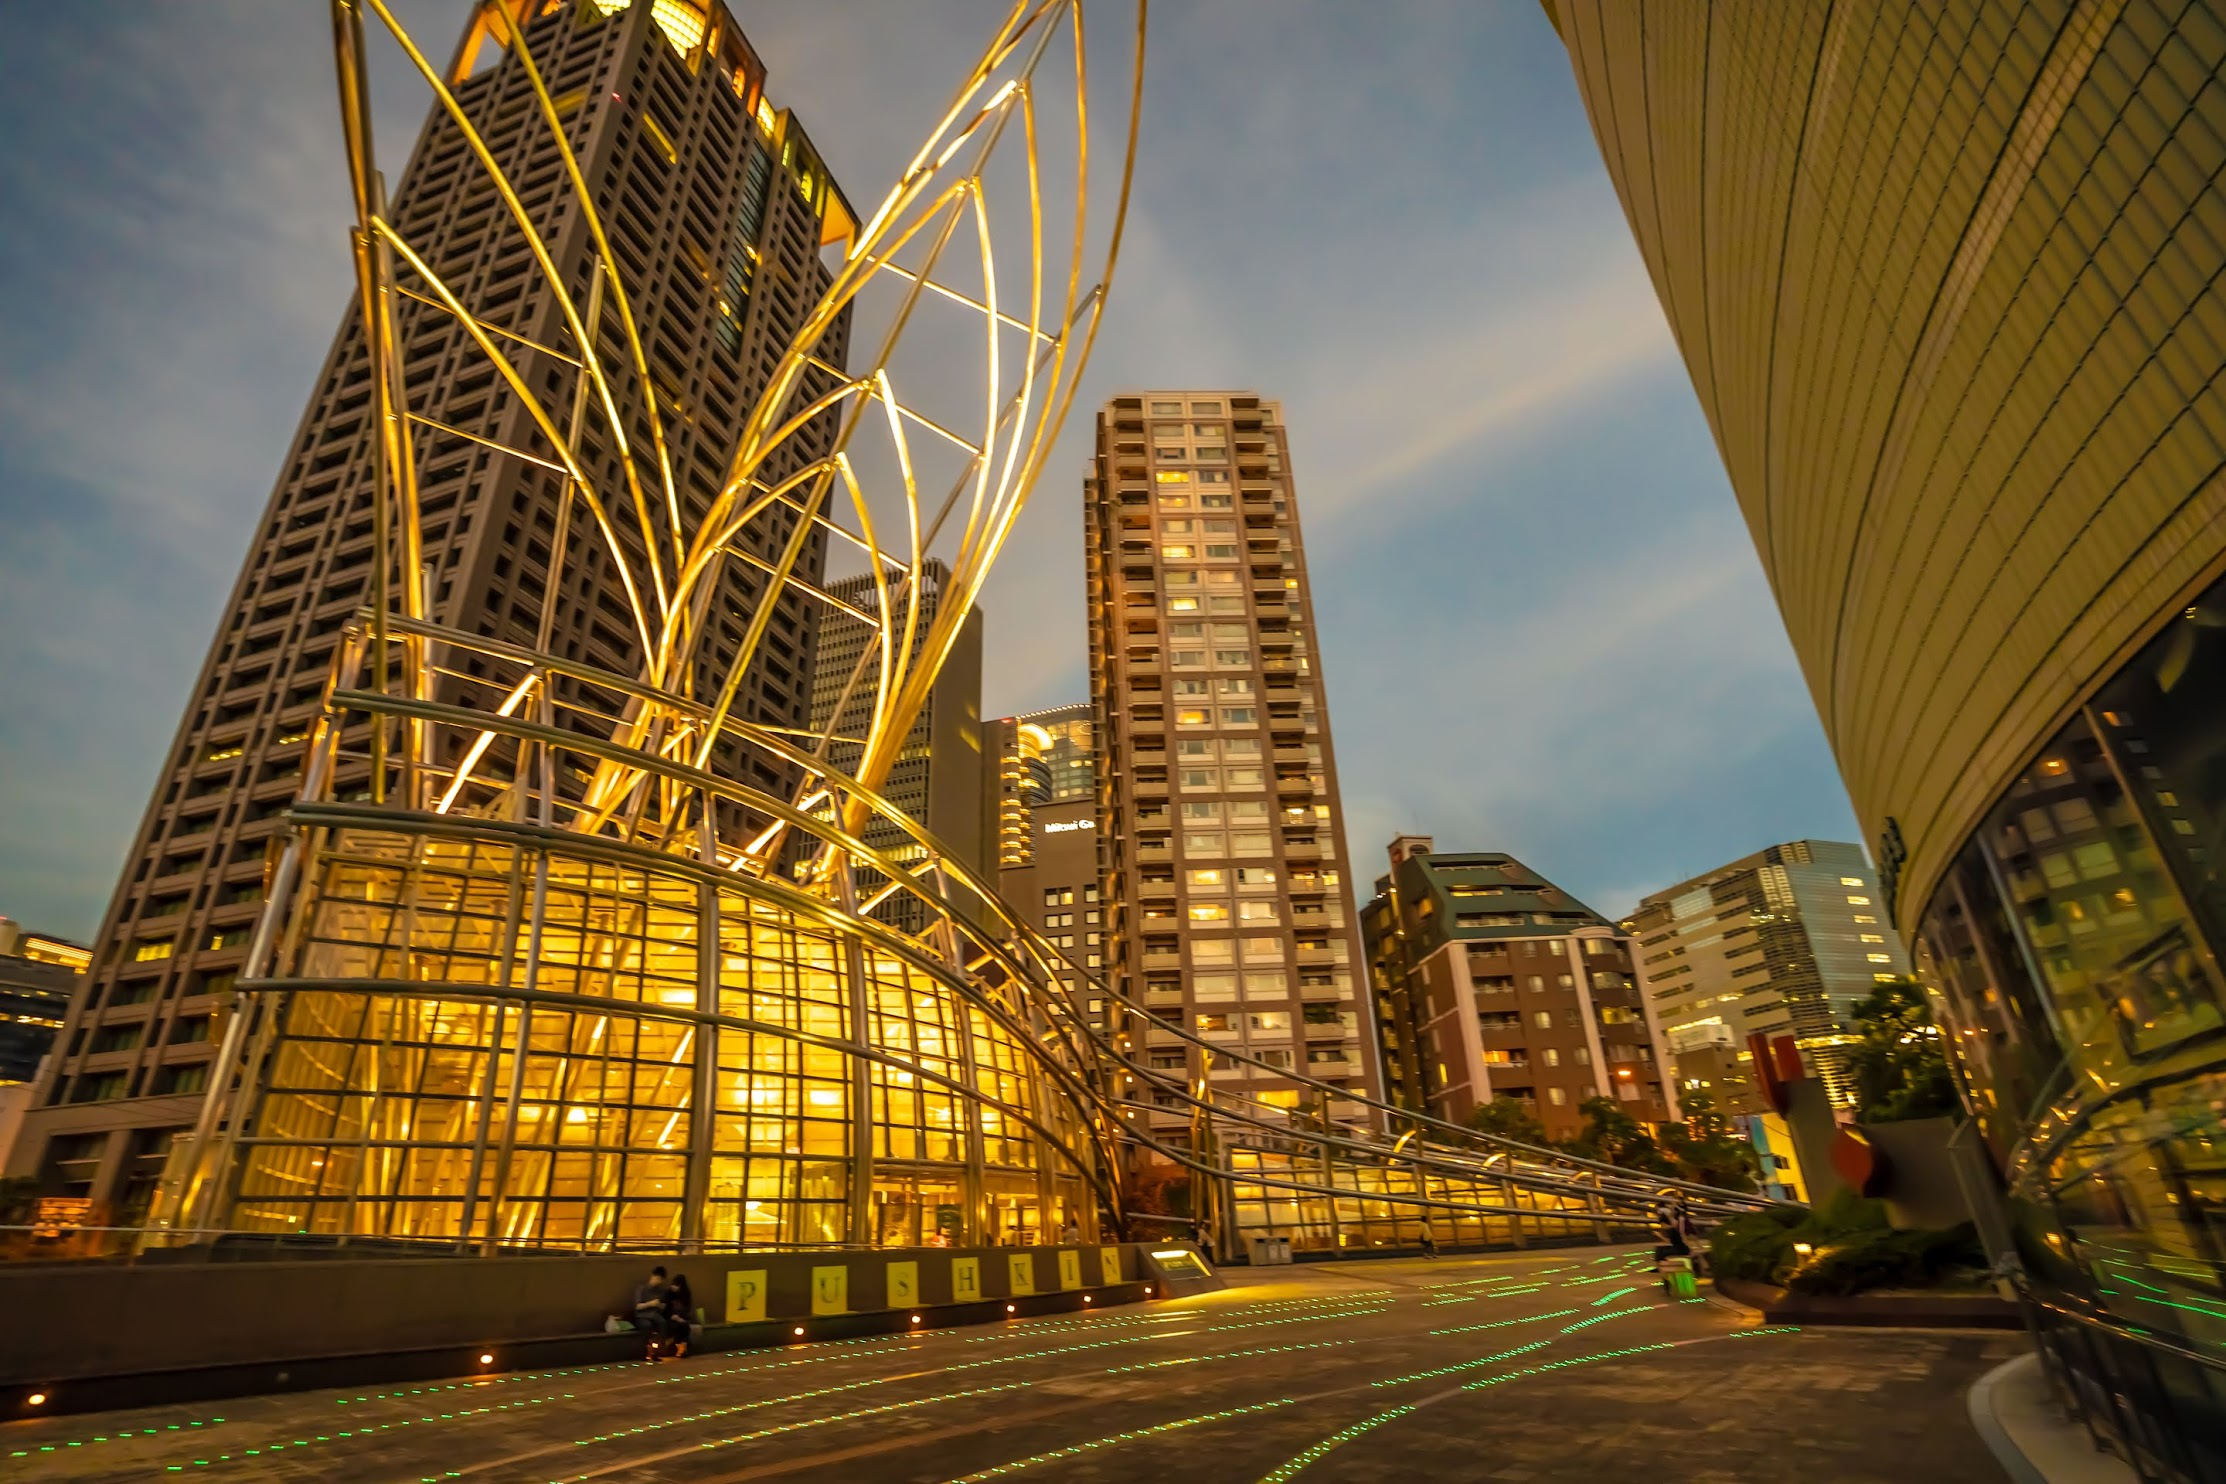 The National Museum of Art, Osaka light-up3